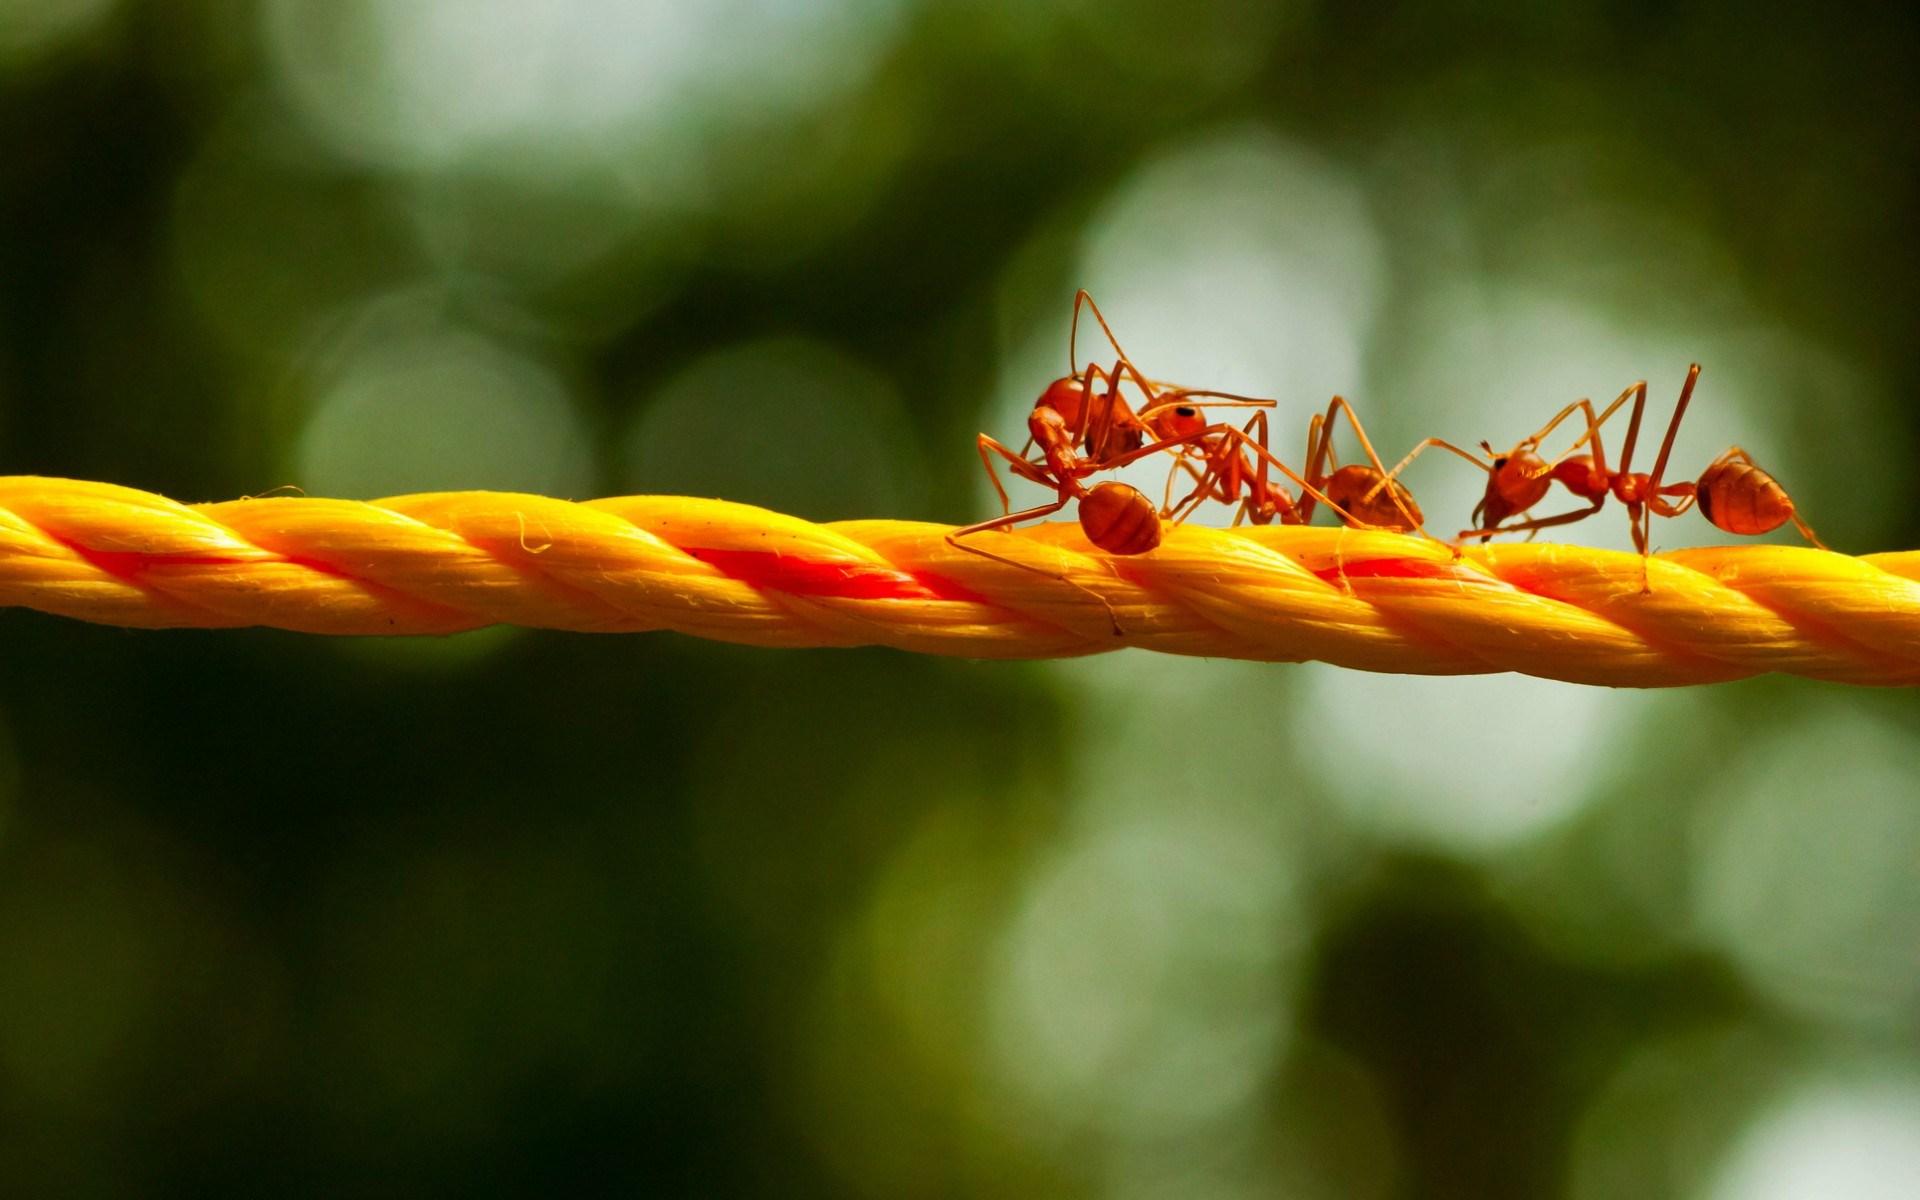 Rope ants